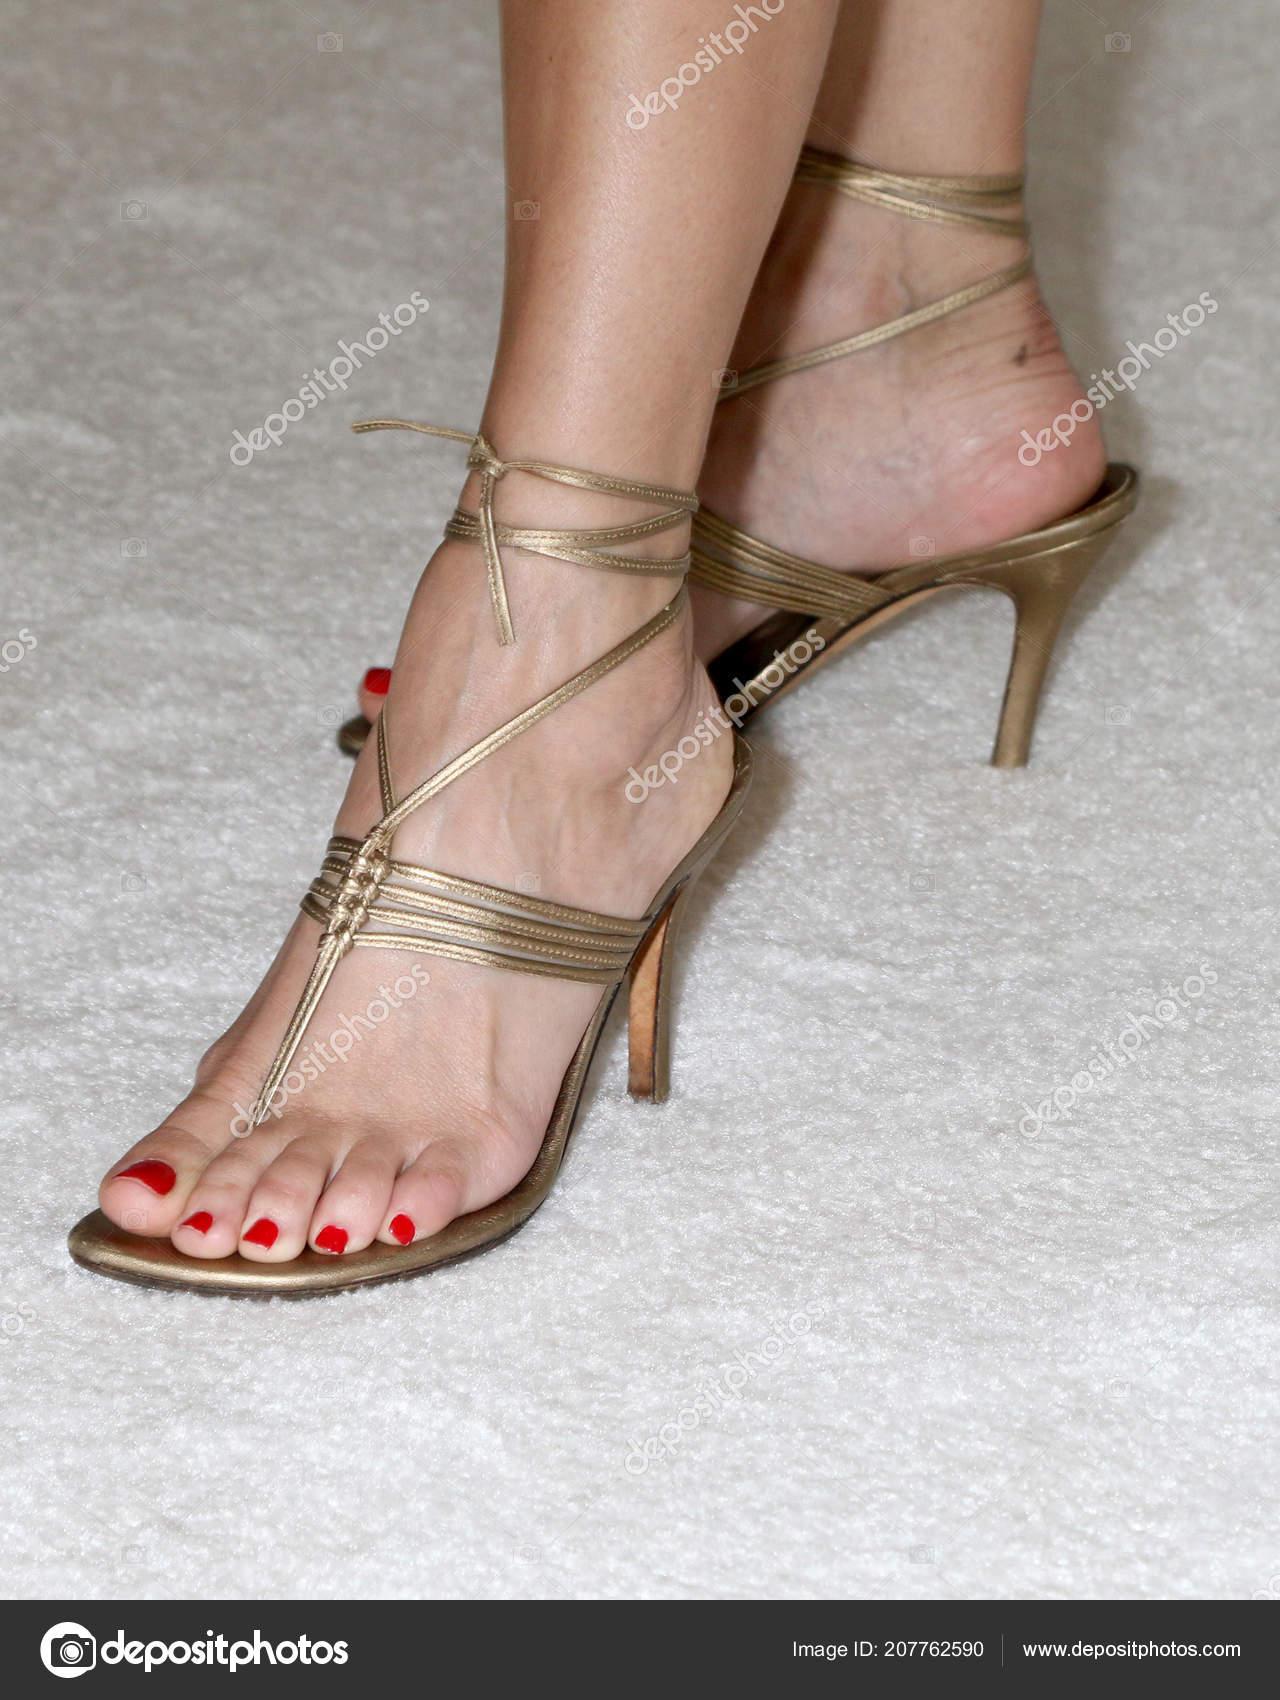 Feet Diane Farr nudes (28 photo), Tits, Leaked, Twitter, cameltoe 2019